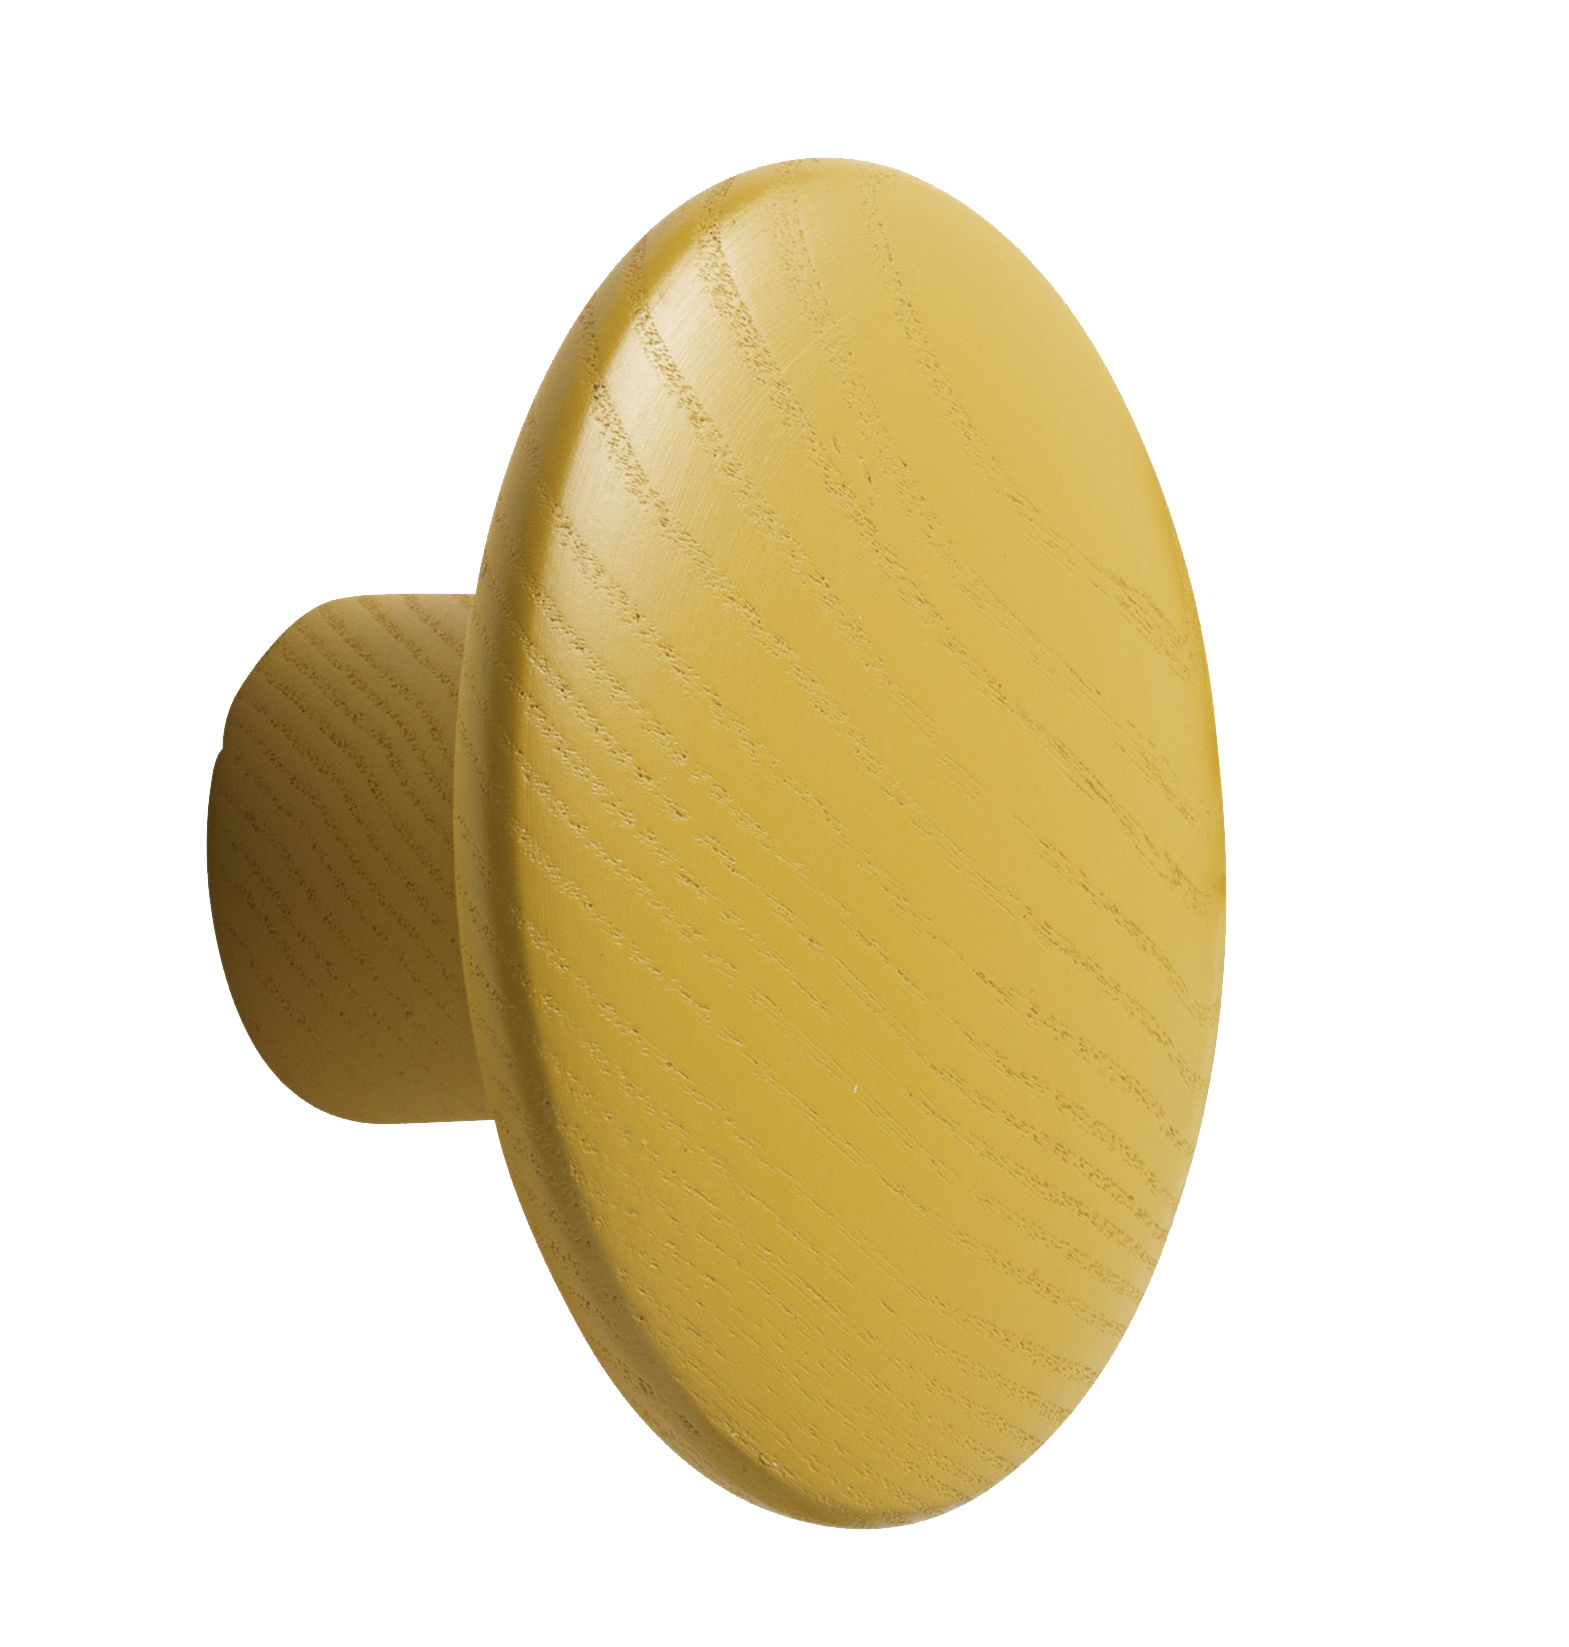 Arredamento - Appendiabiti  - Gancio The dots / Small - Ø 9 cm - Muuto - Giallo senape - Frassino tinto